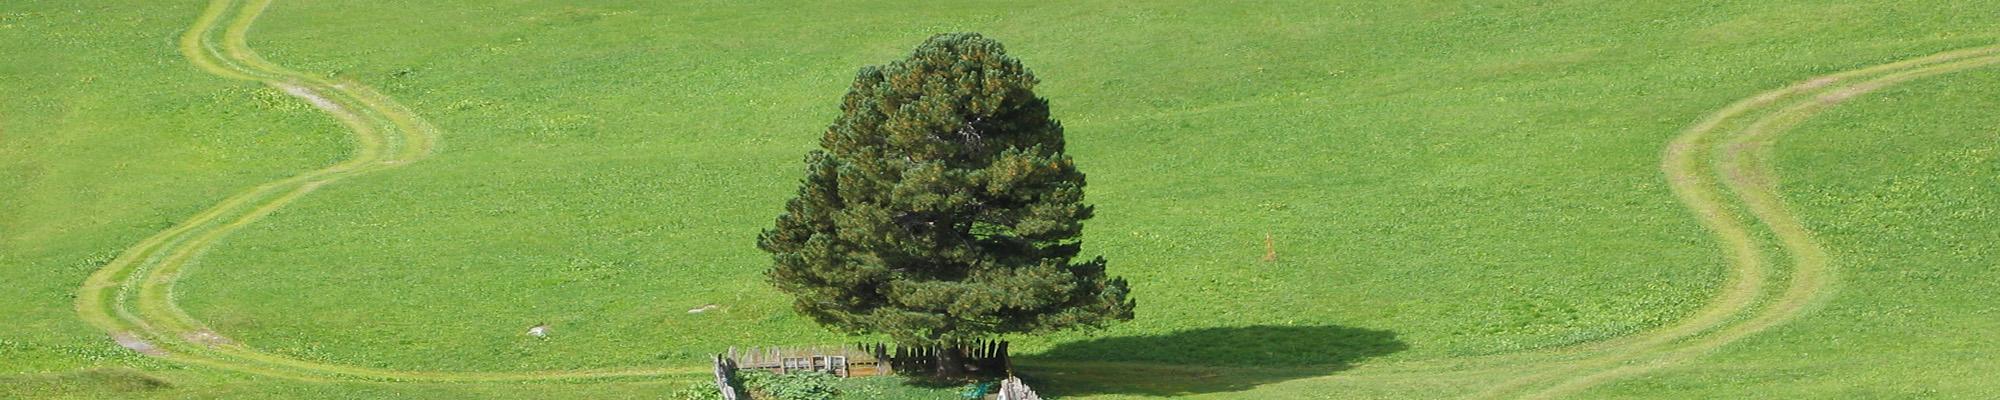 Header Bäume